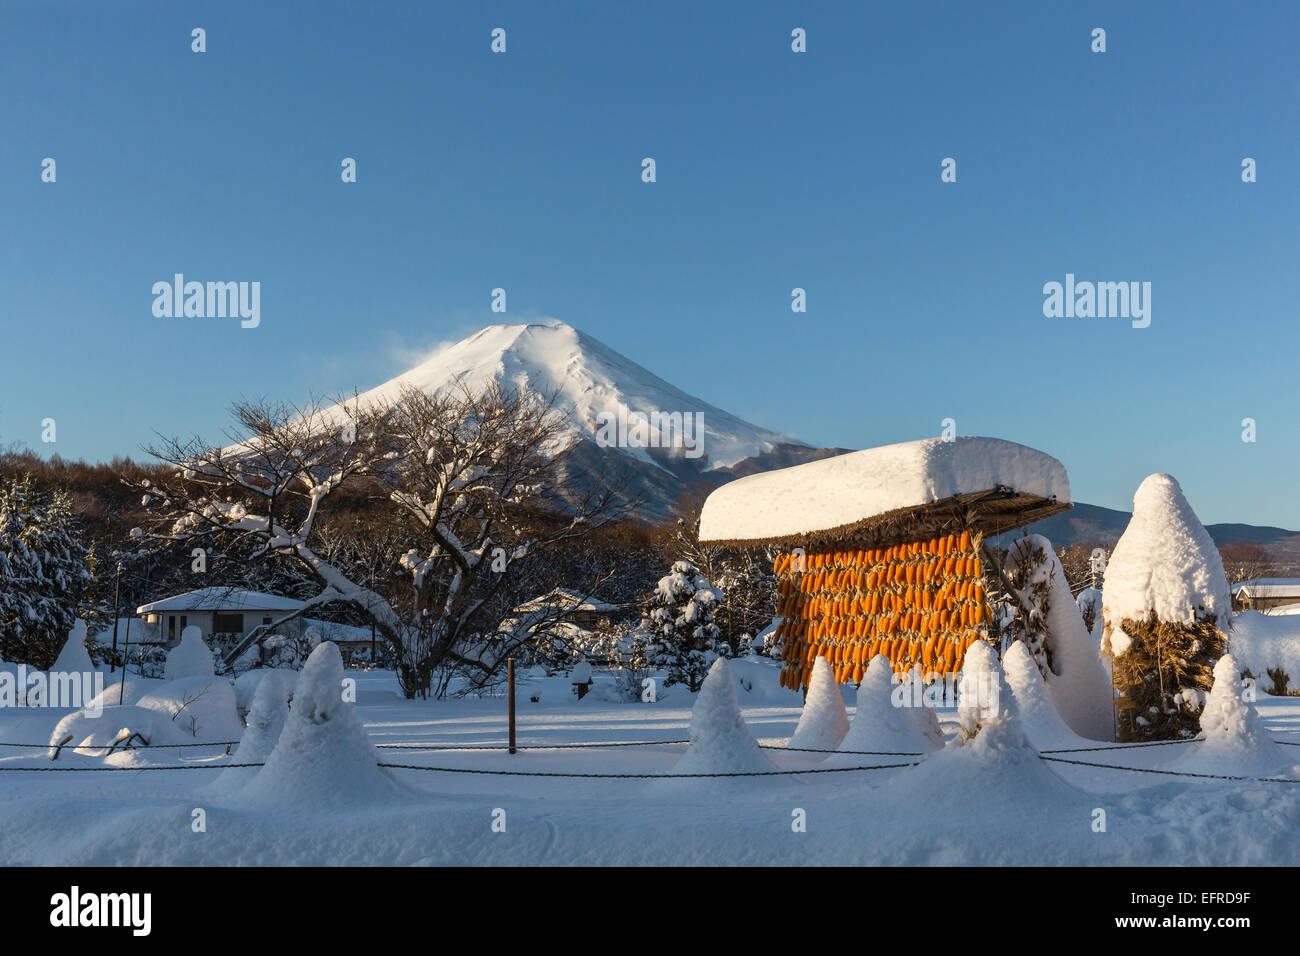 Mount Fuji and Snowfield, Yamanashi, Japan - Stock Image